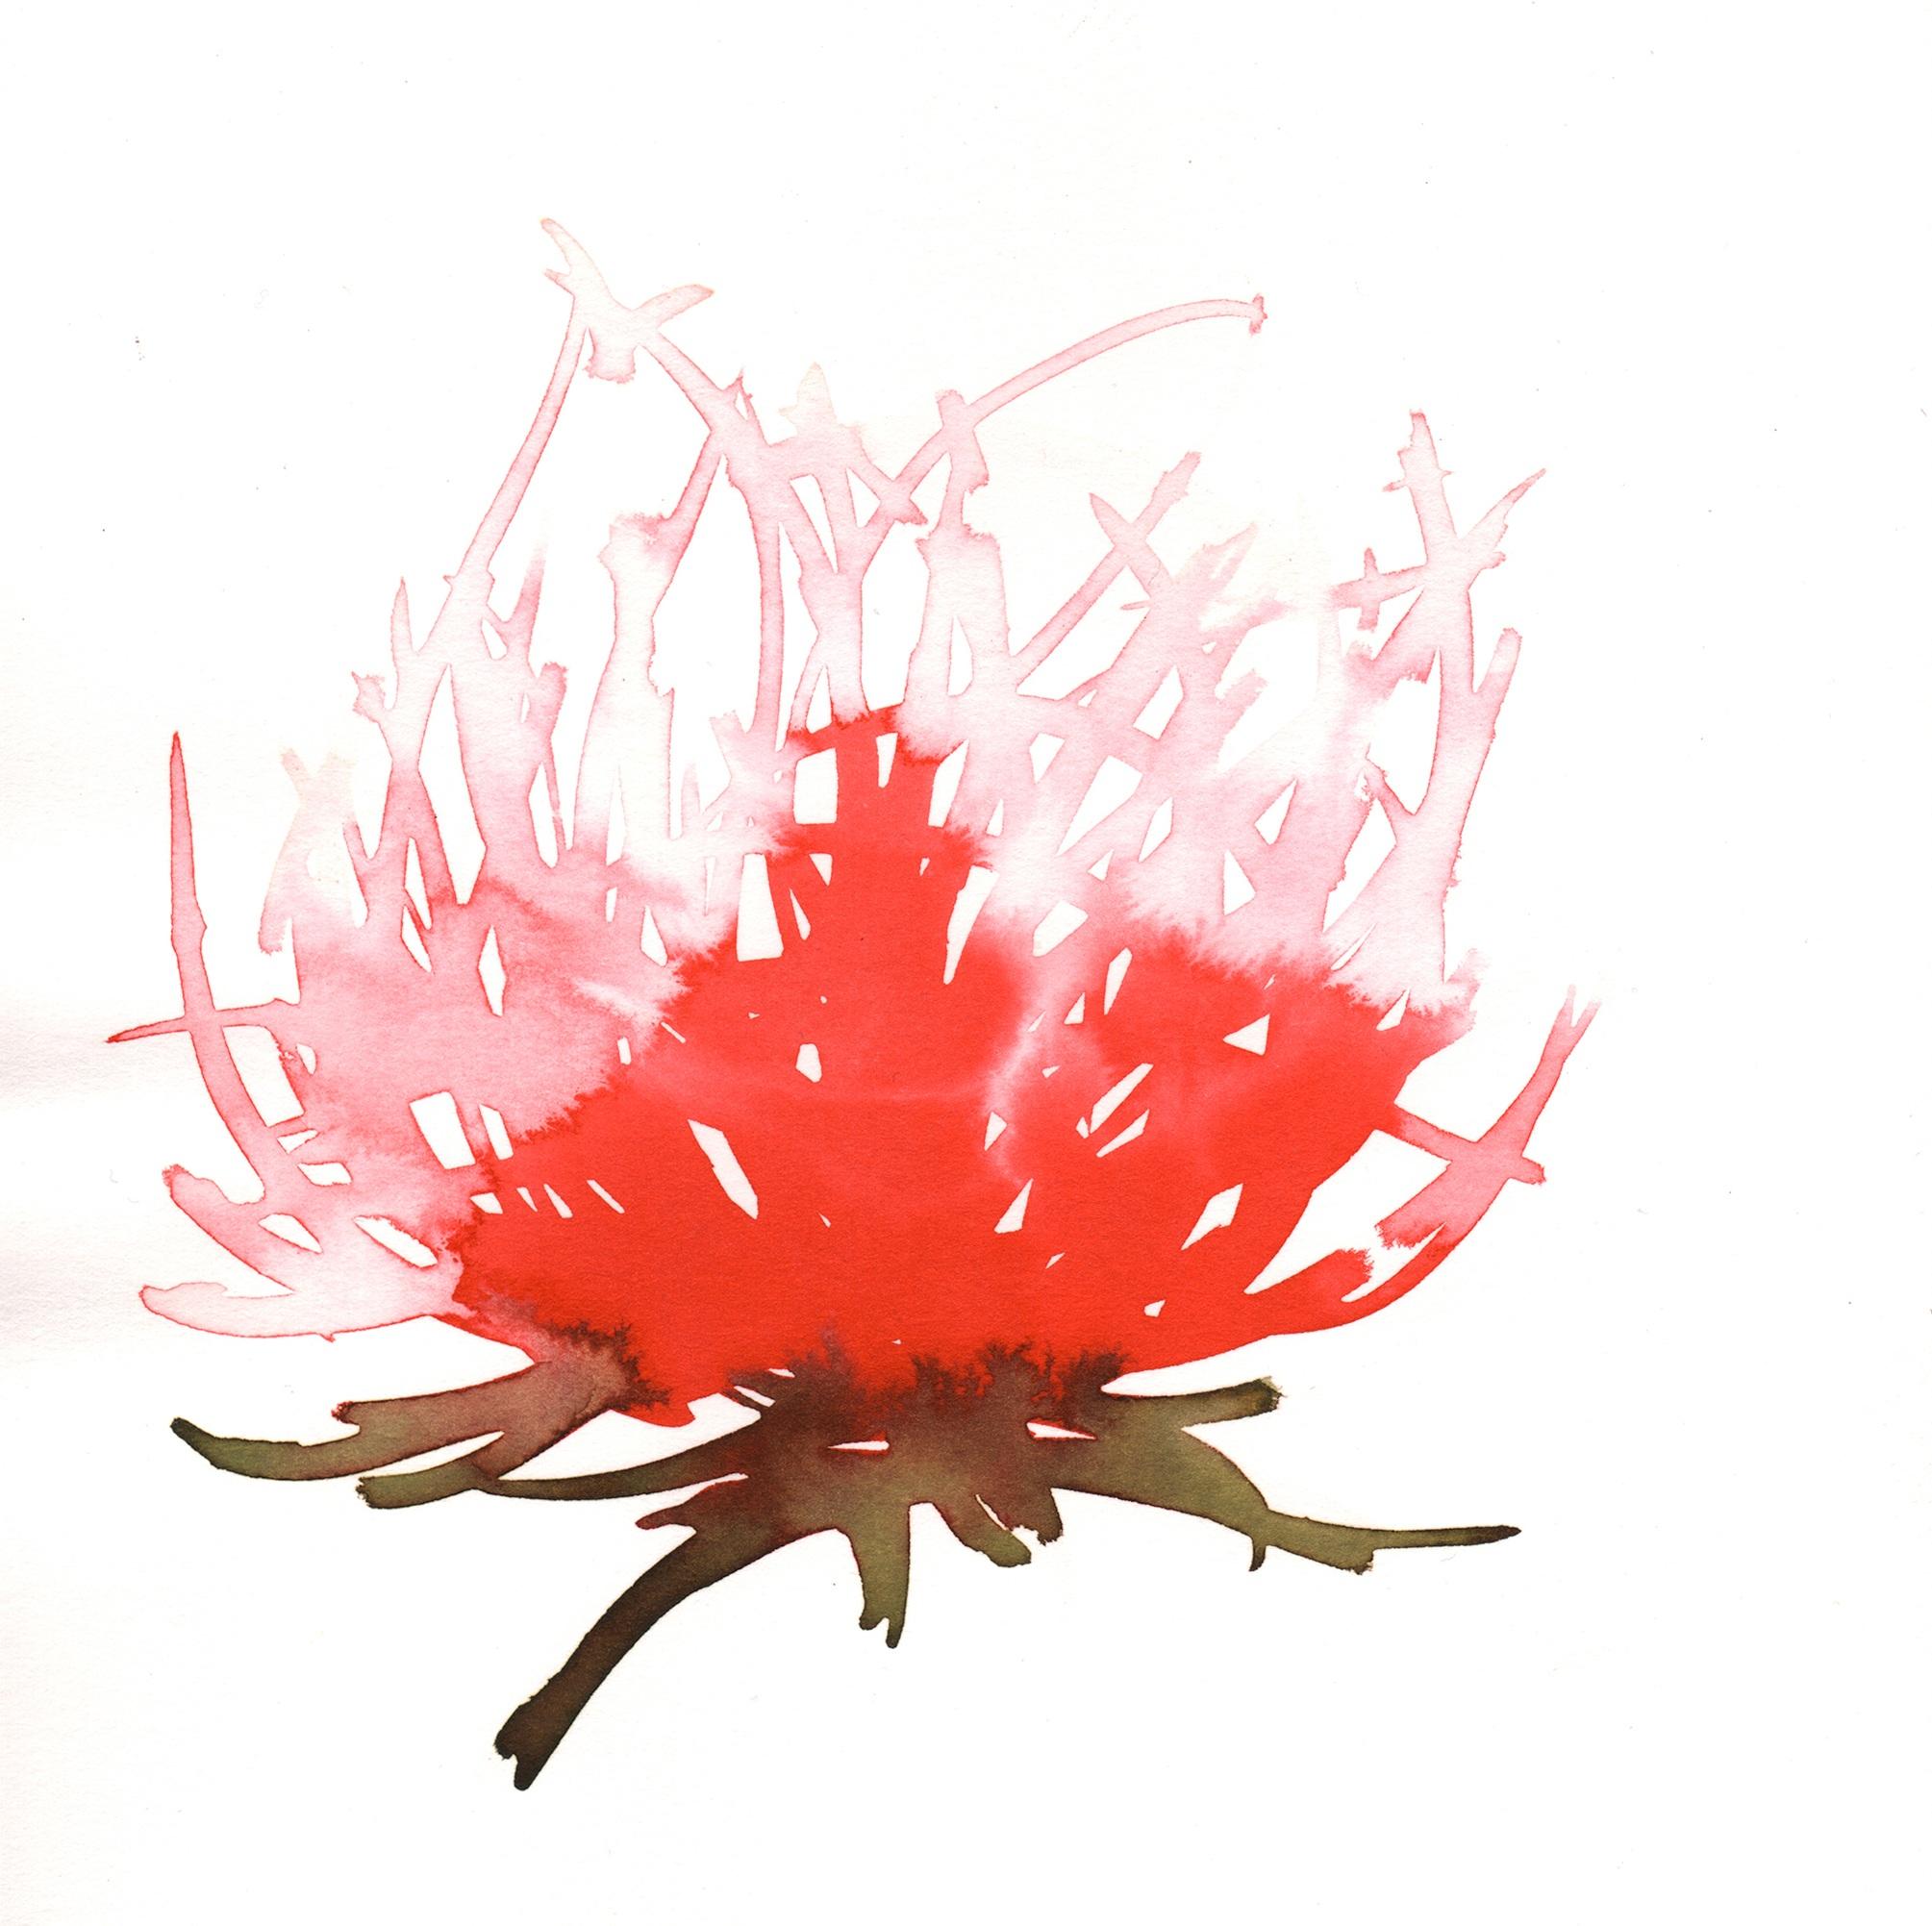 255.Blood.Lily.10.21.14.jpg